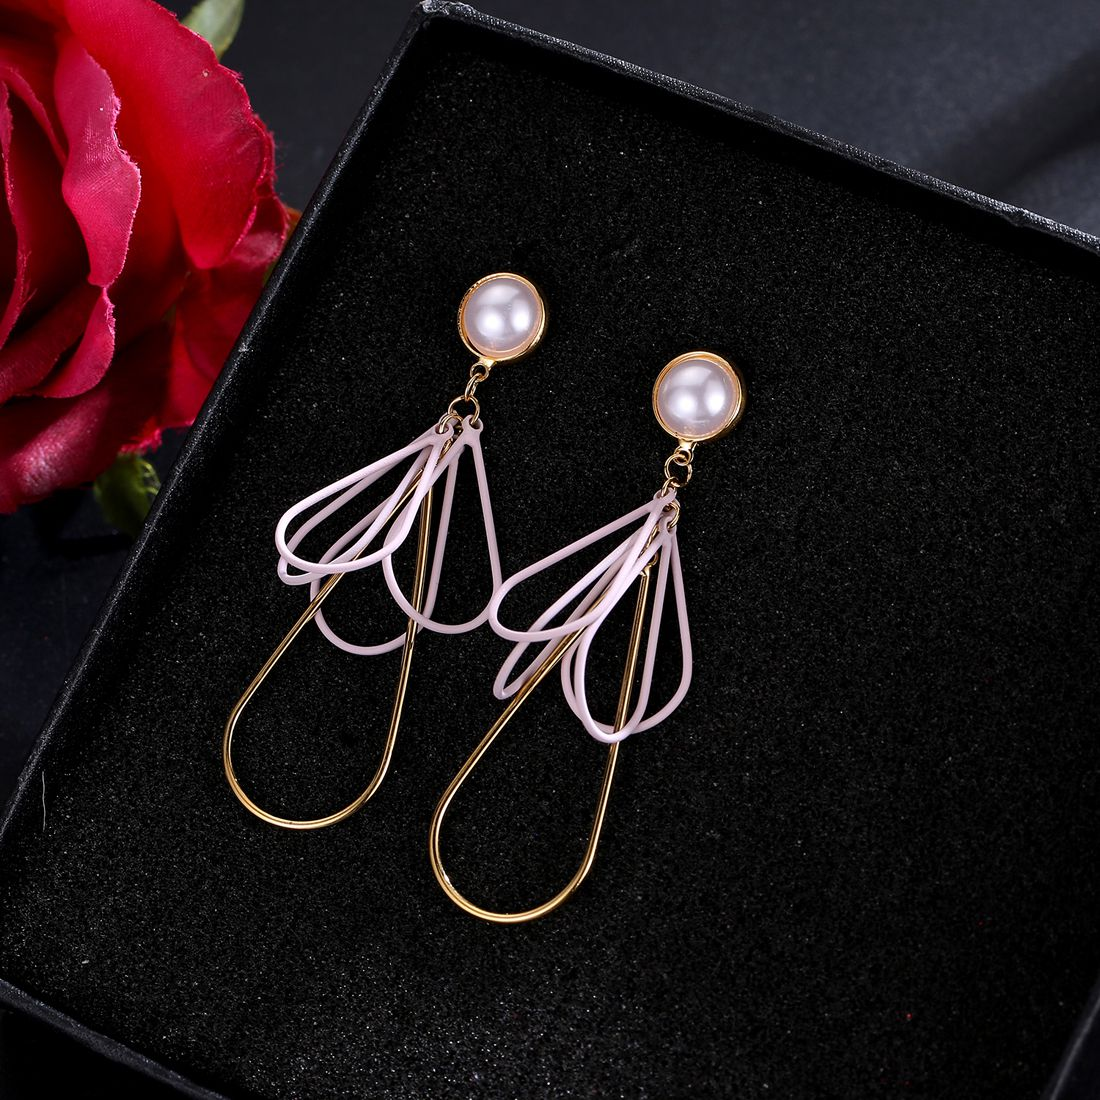 Jewels Galaxy Exclusive Luxuria Flawless Pearl Multicolor Dangler Earrings For Women/Girls